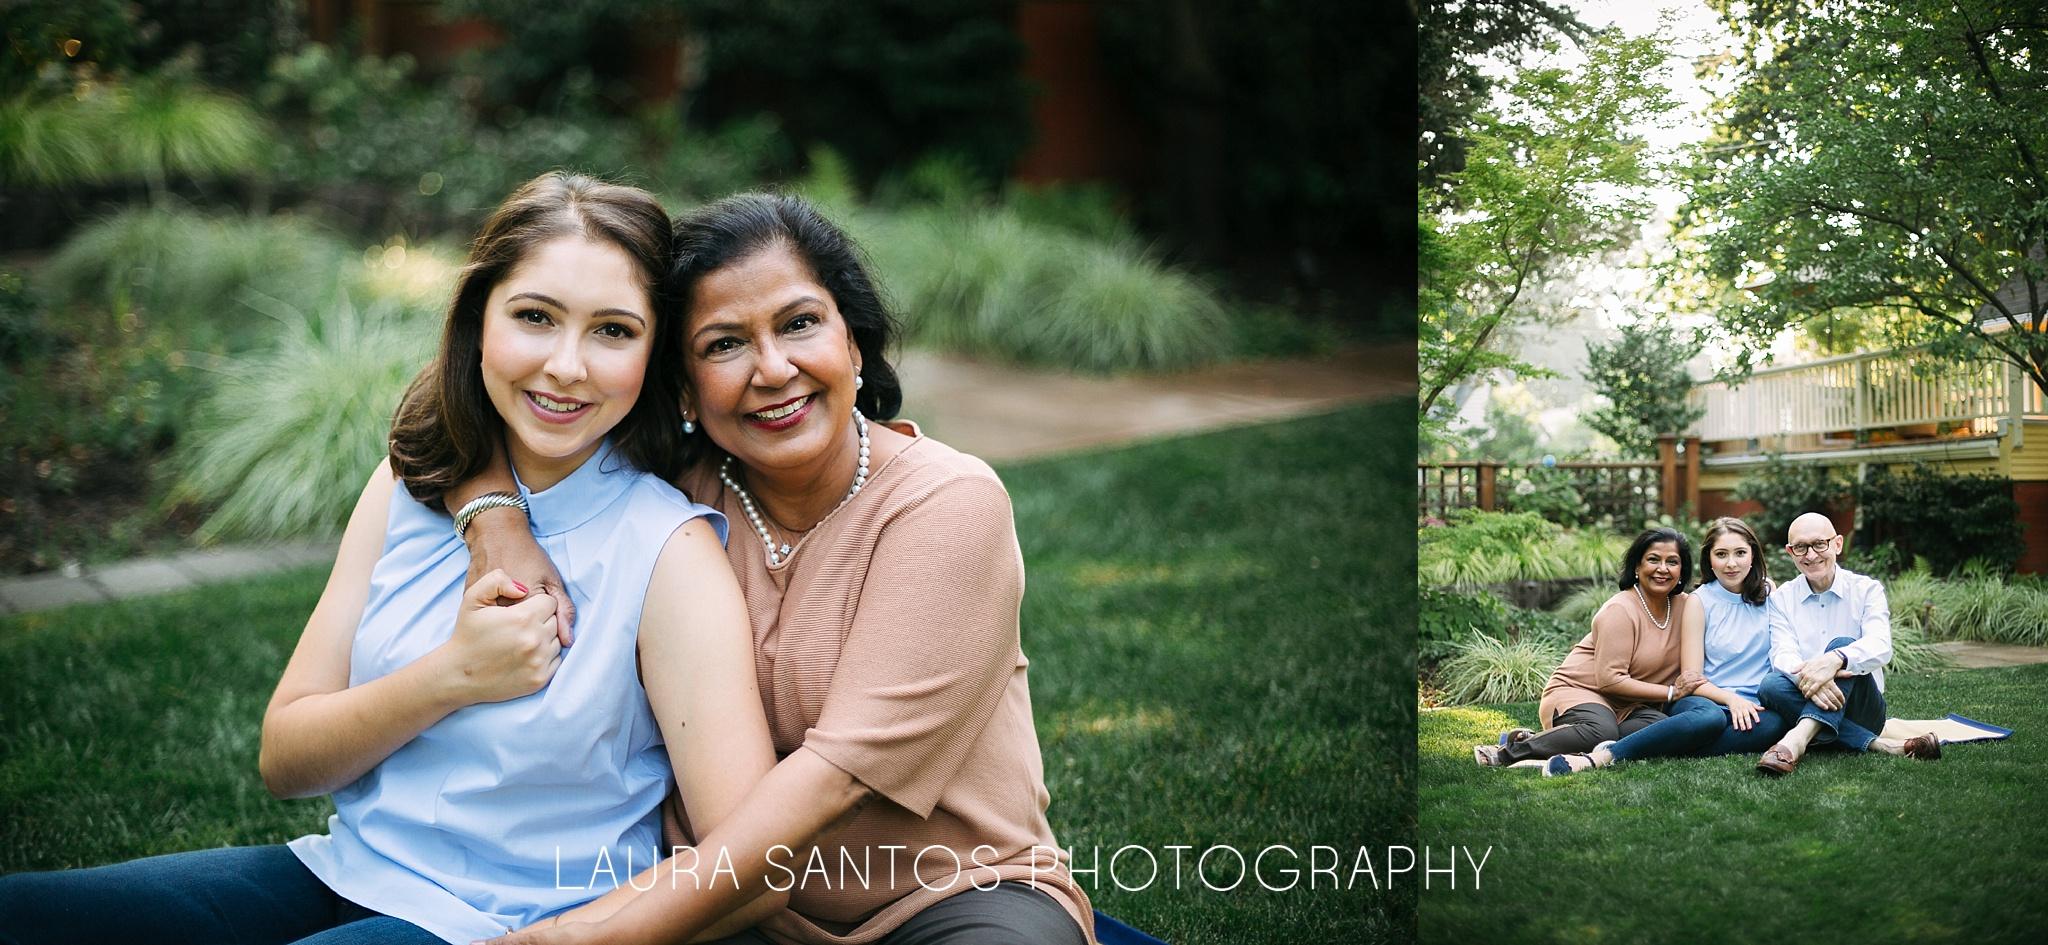 Laura Santos Photography Portland Oregon Family Photographer_0424.jpg